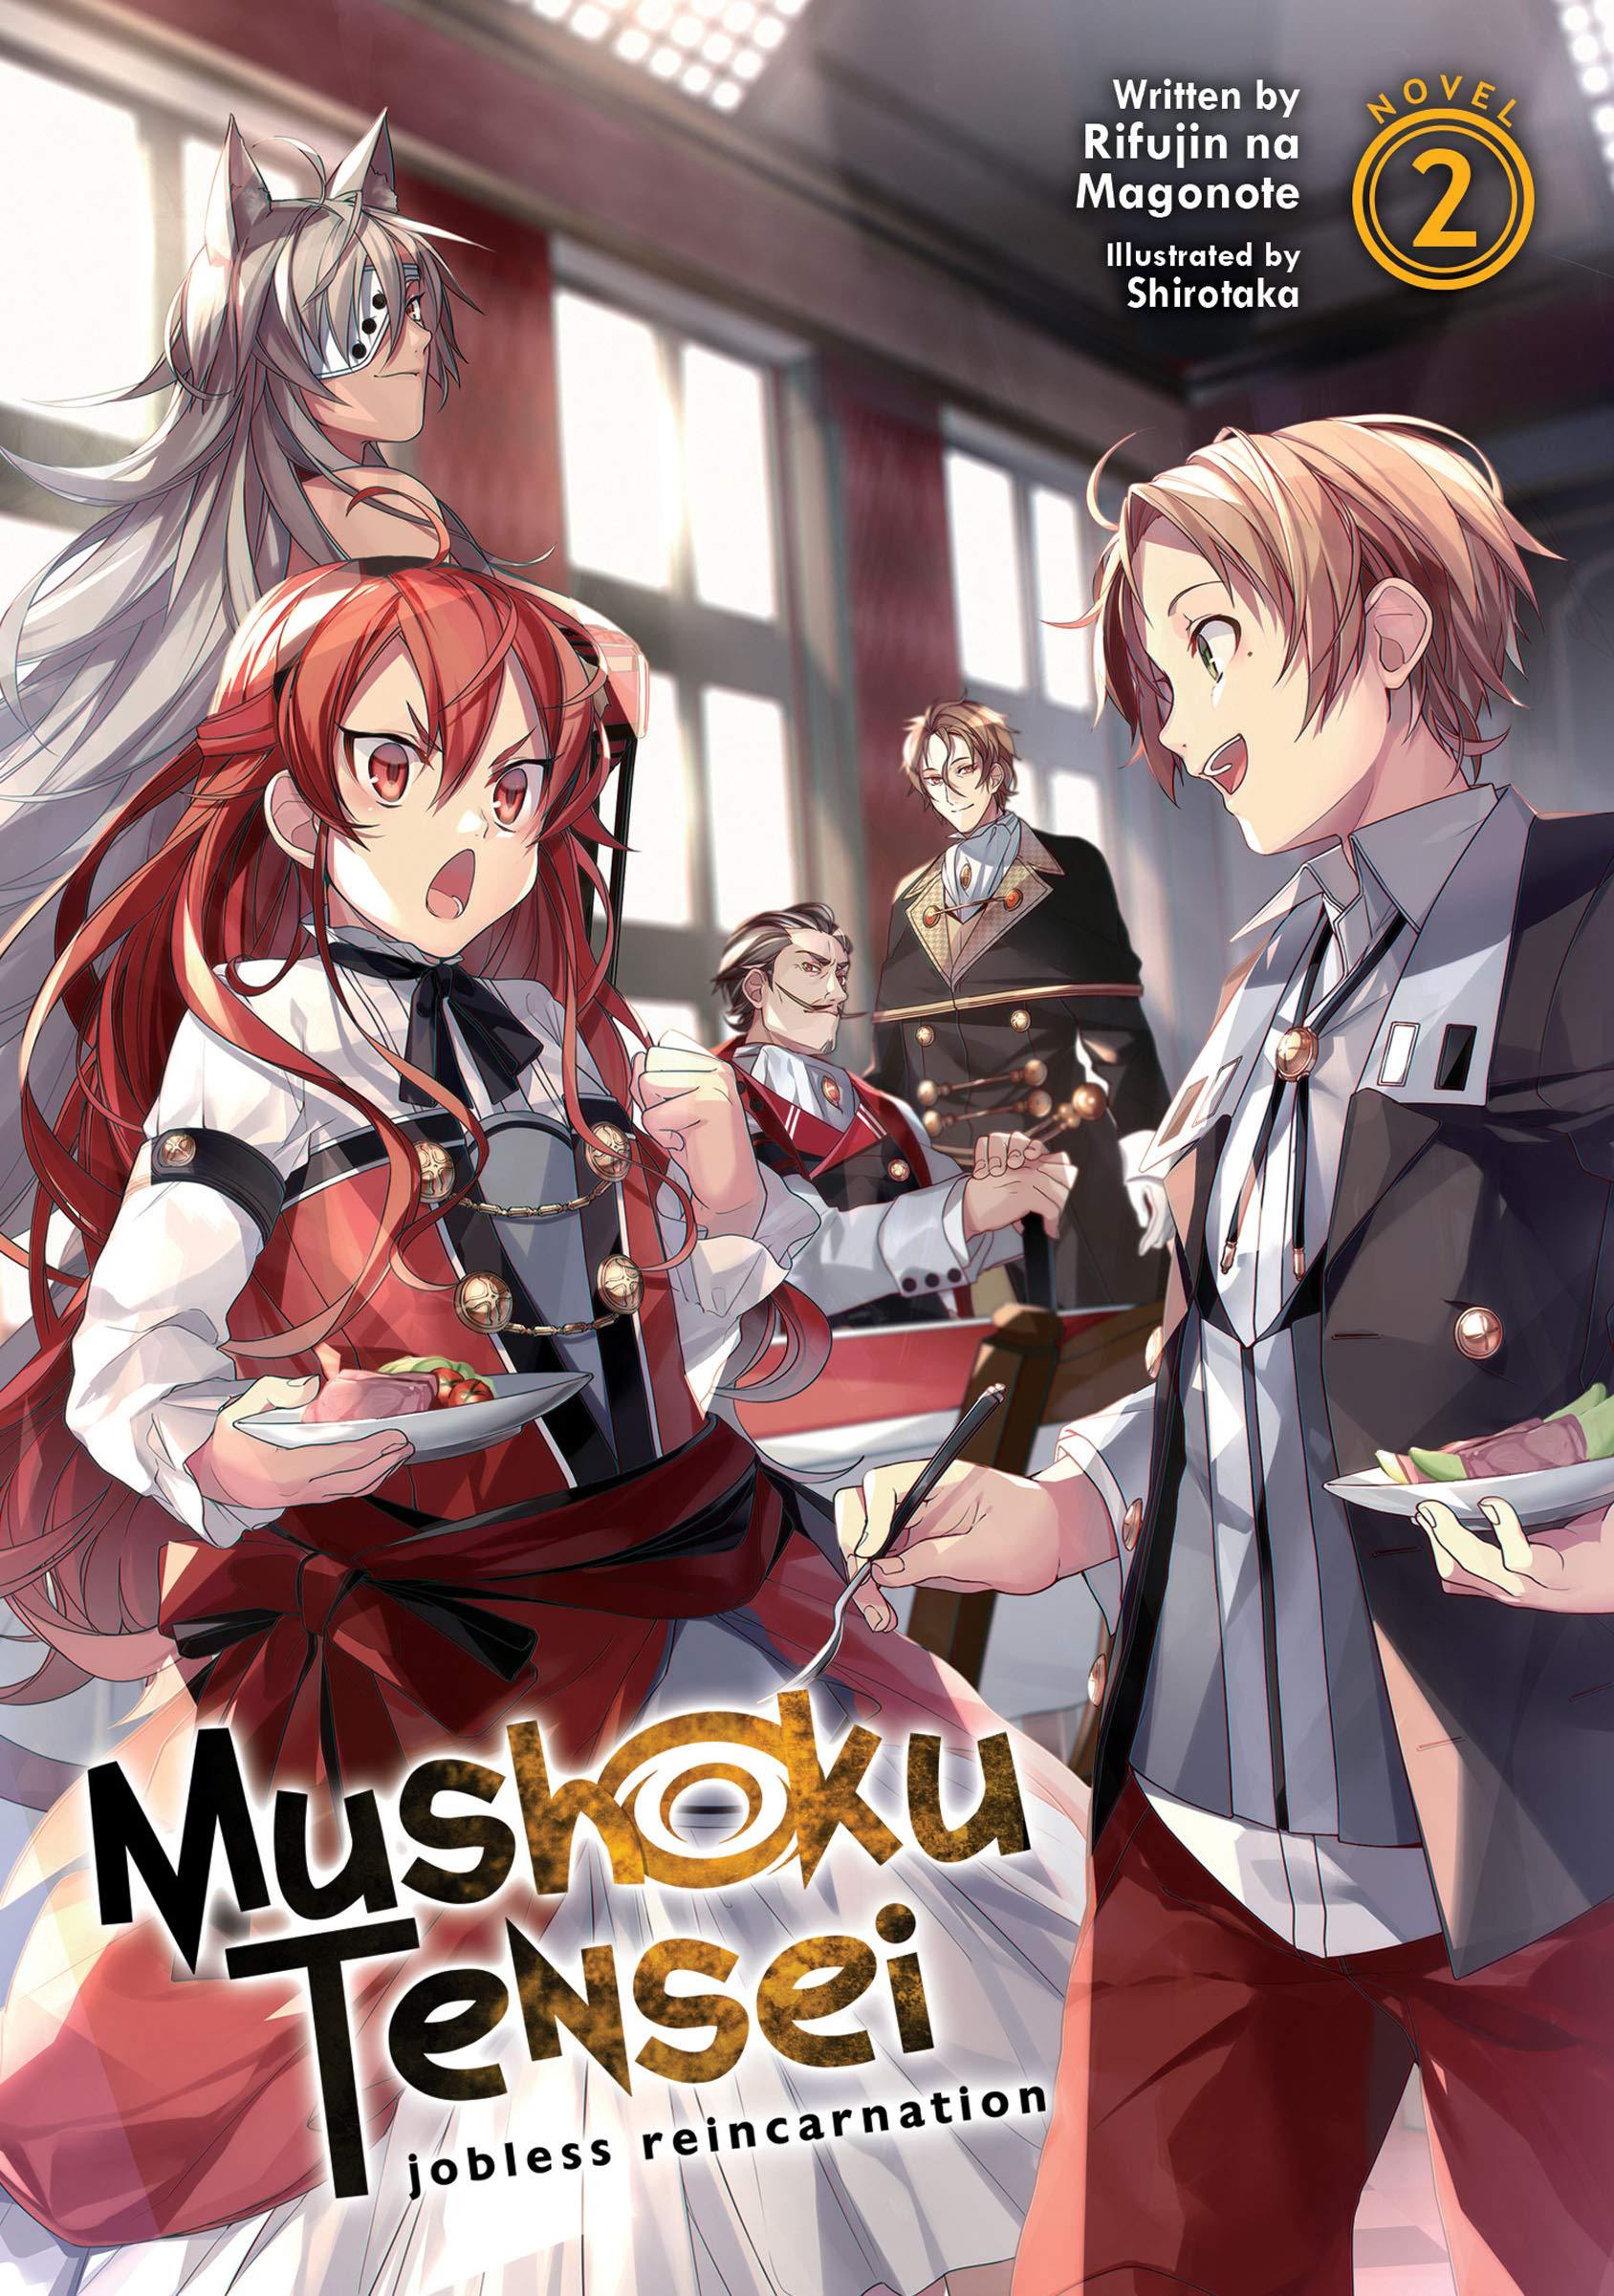 Mushoku Tensei: Jobless Reincarnation (Light Novel) Vol. 2 por Rifujin na Magonote